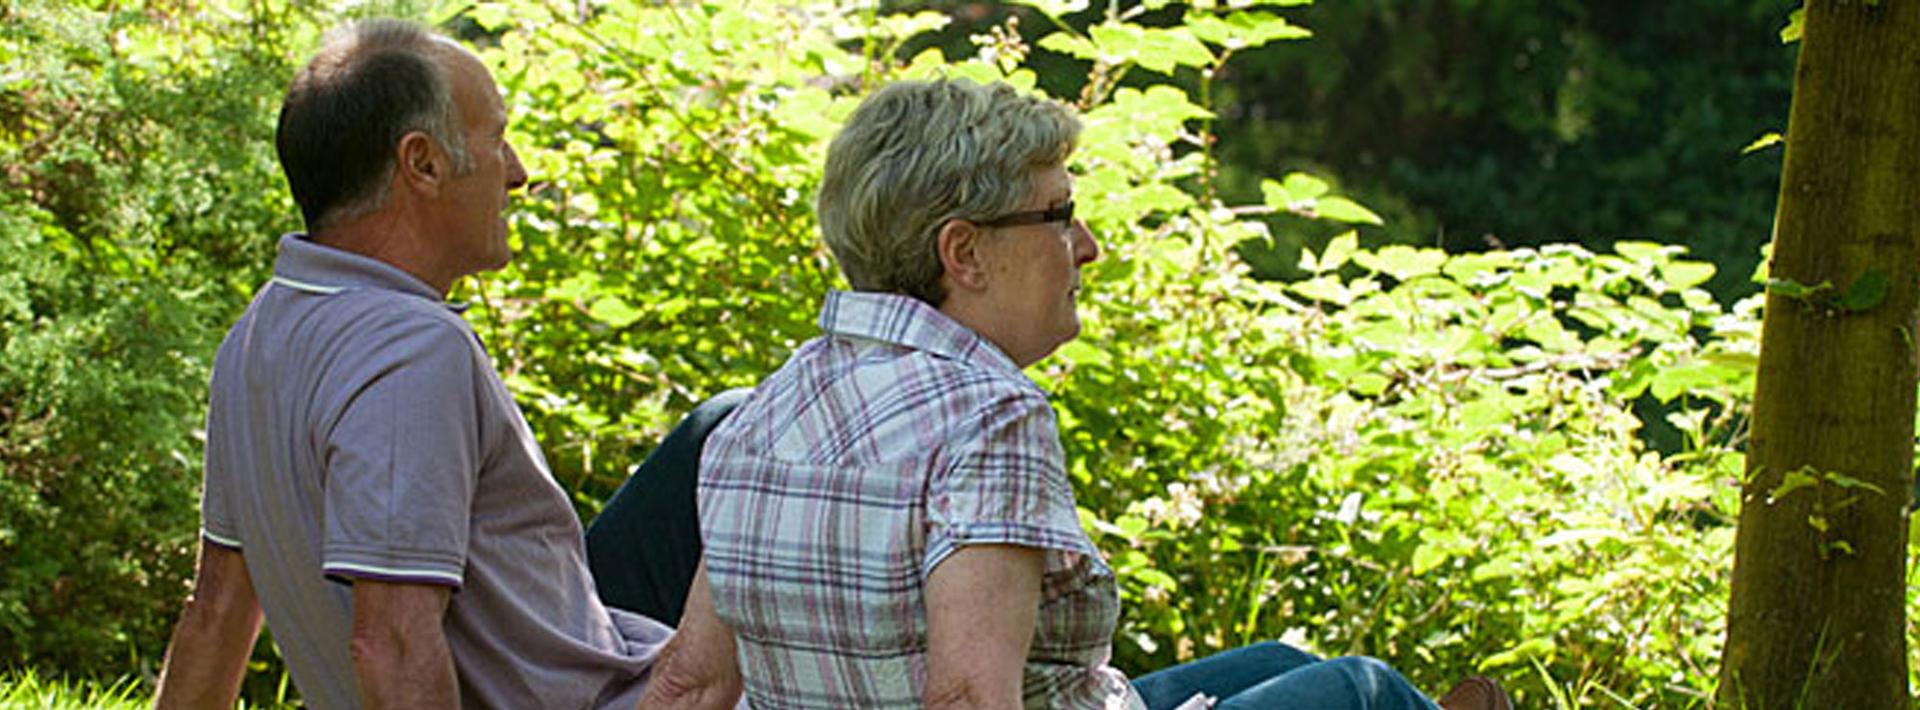 journal rencontres seniors